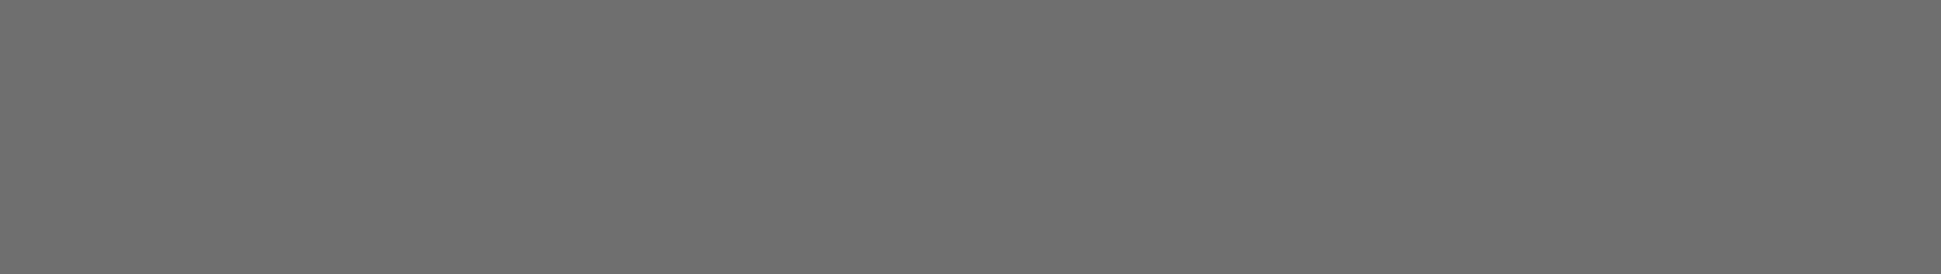 160606-xenios-logo-4C-RZ